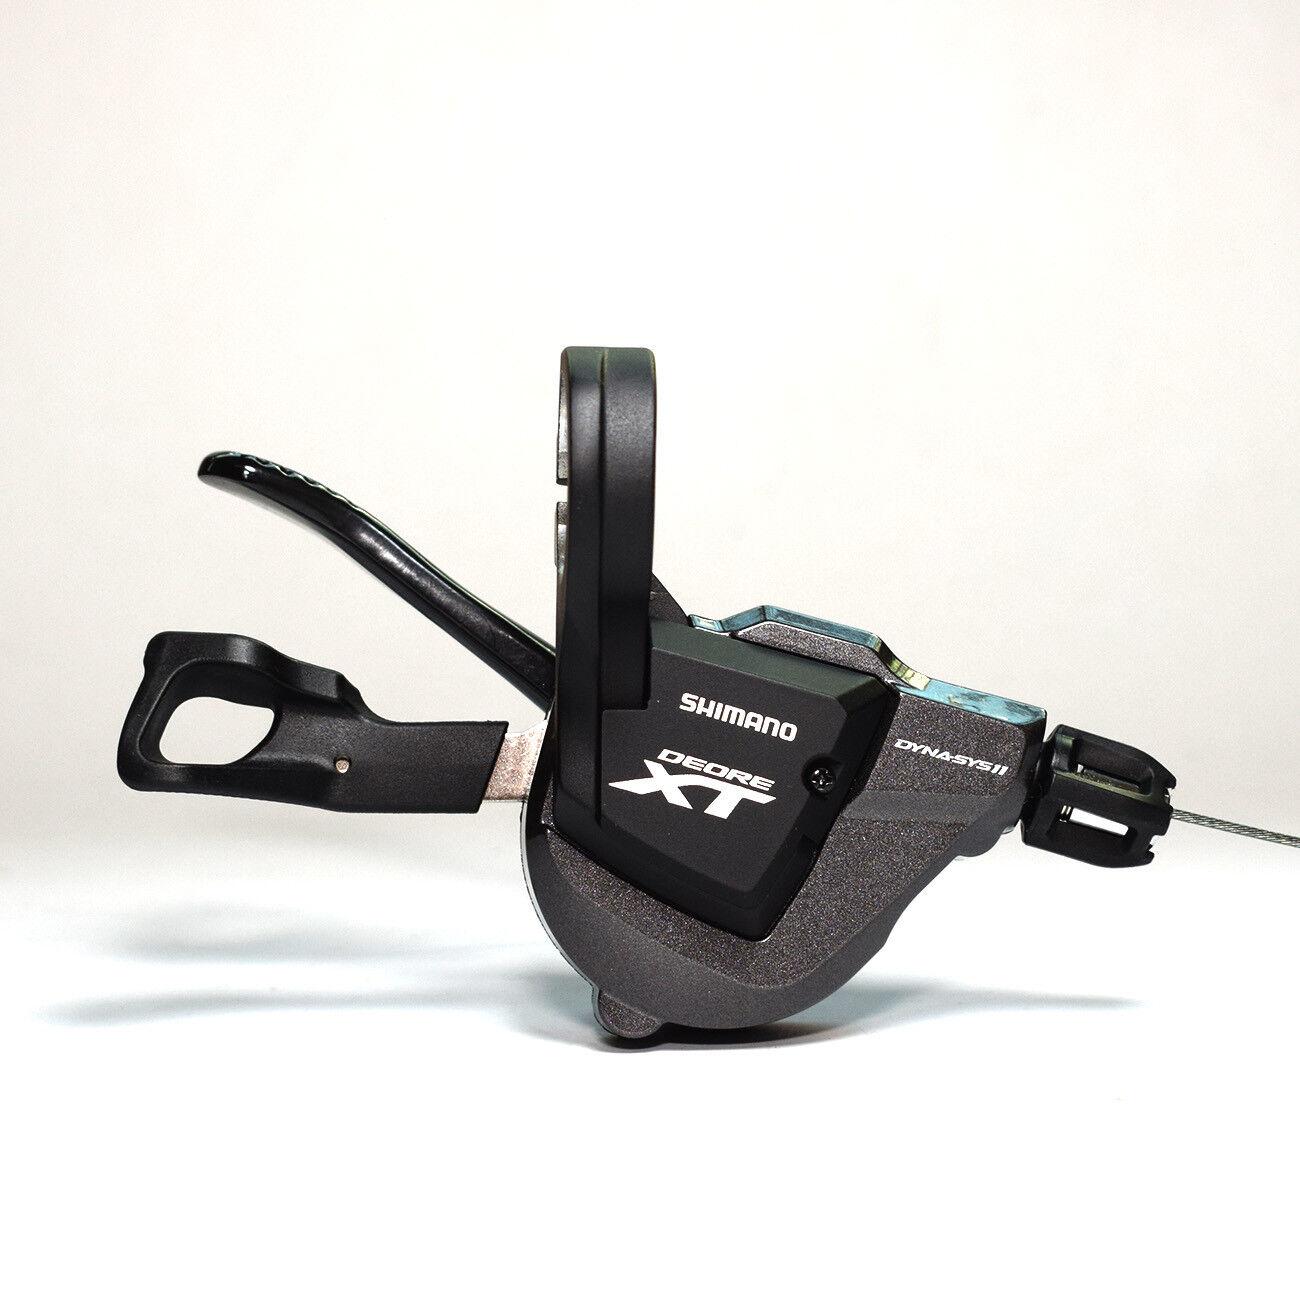 Shimano Deore XT SL-M8000 11-Speed Rapidfire  Right Shifter  good reputation